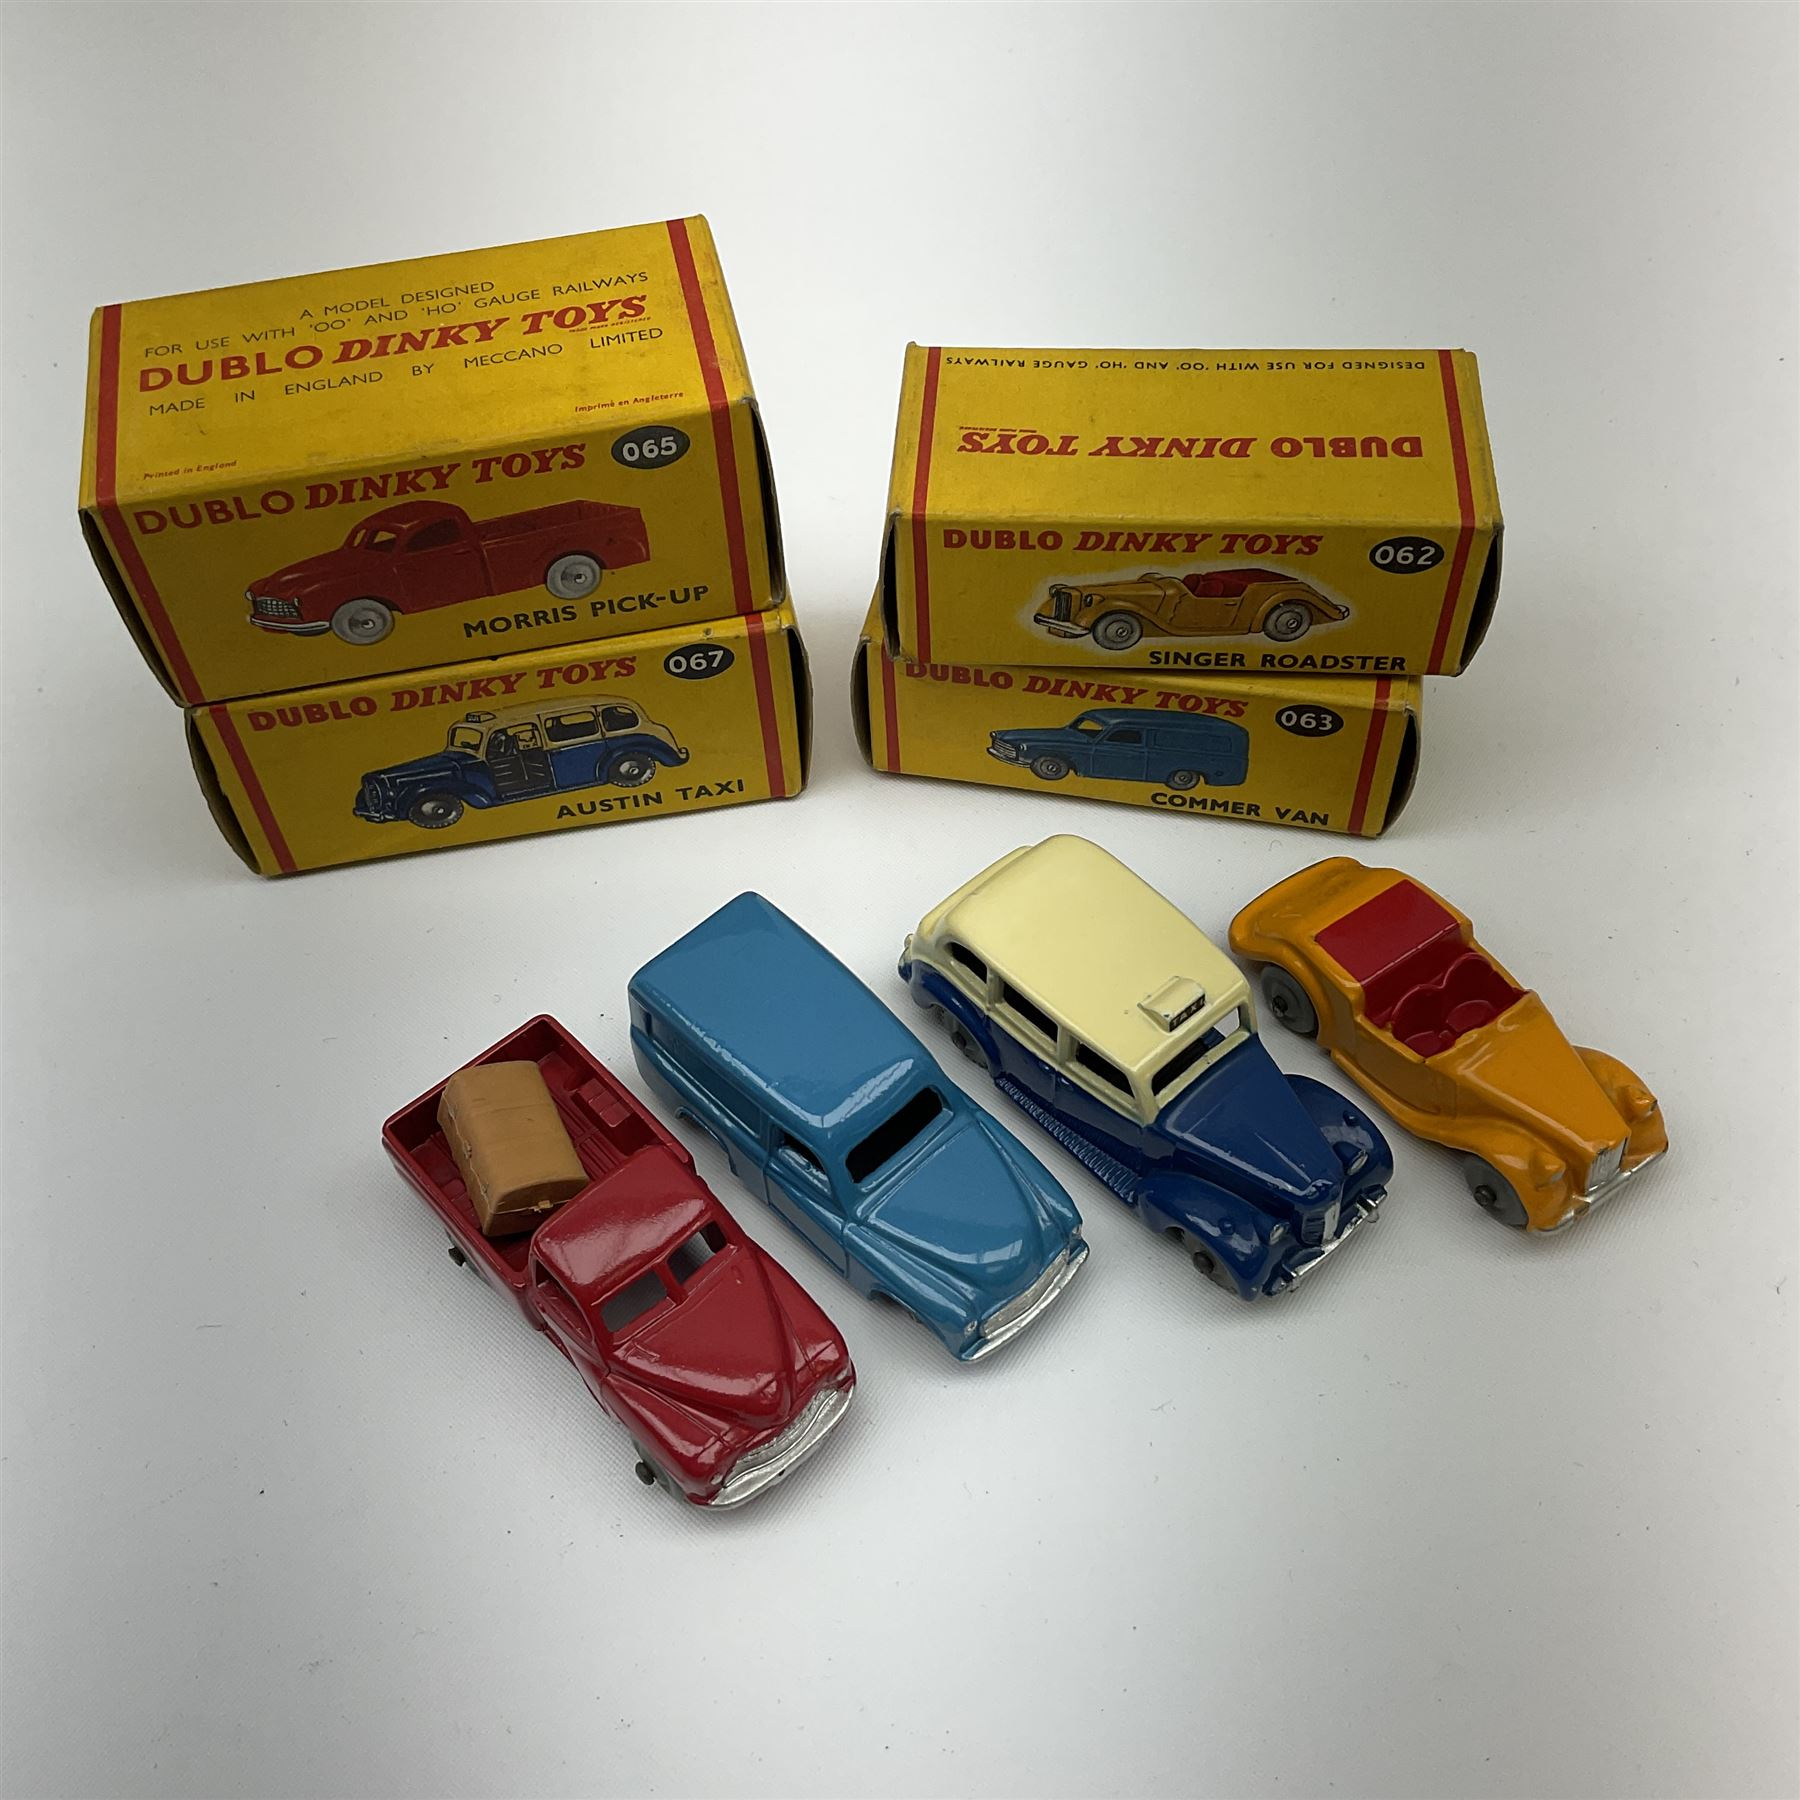 Dublo Dinky - four boxed models comprising 062 Singer Roadster - Image 2 of 4